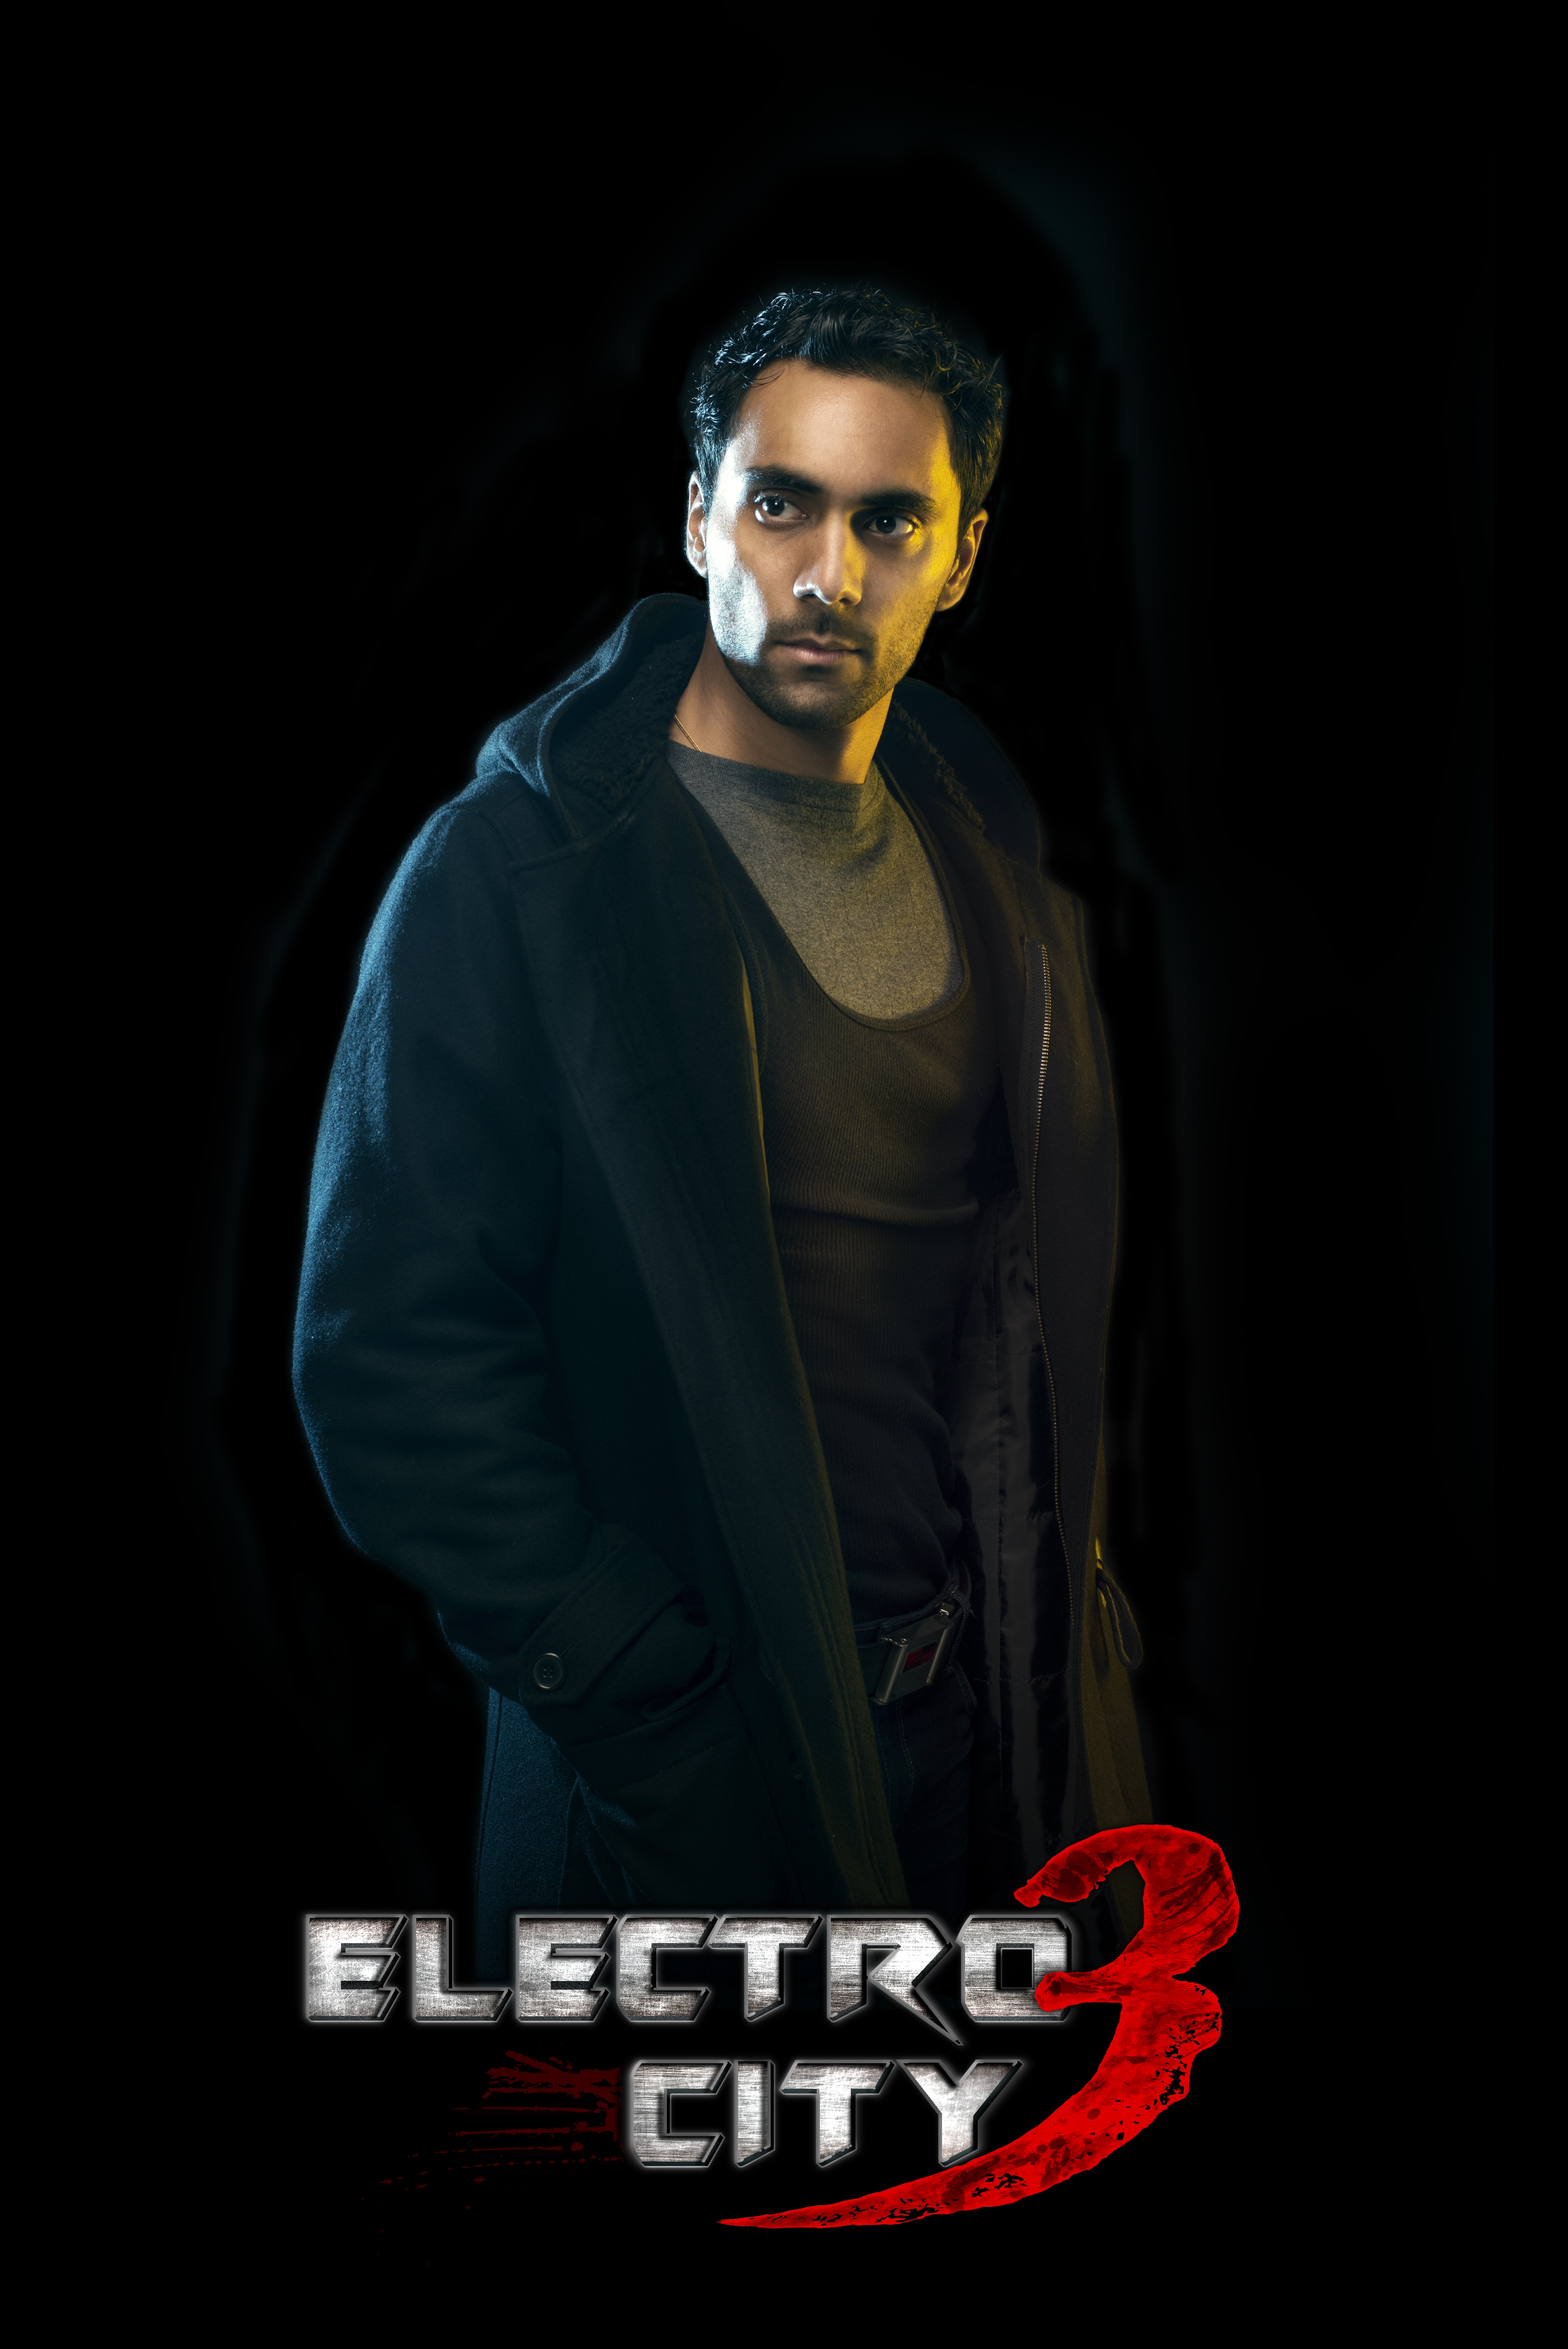 Electro City 3 - Draven